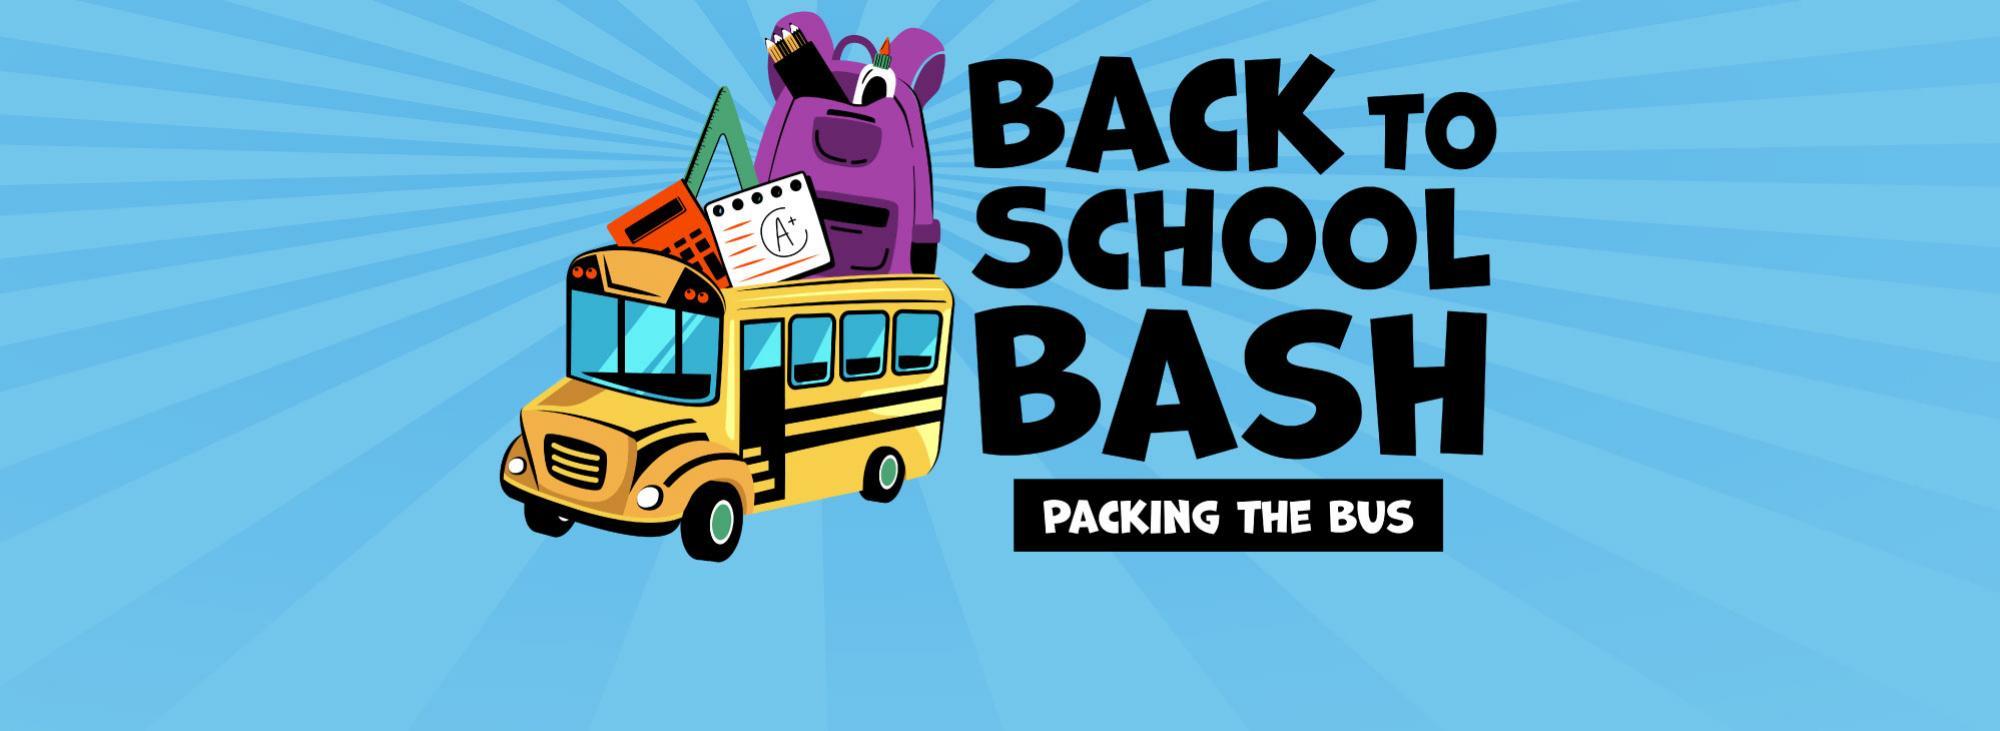 Back to School Bash - City of Alexandria, La